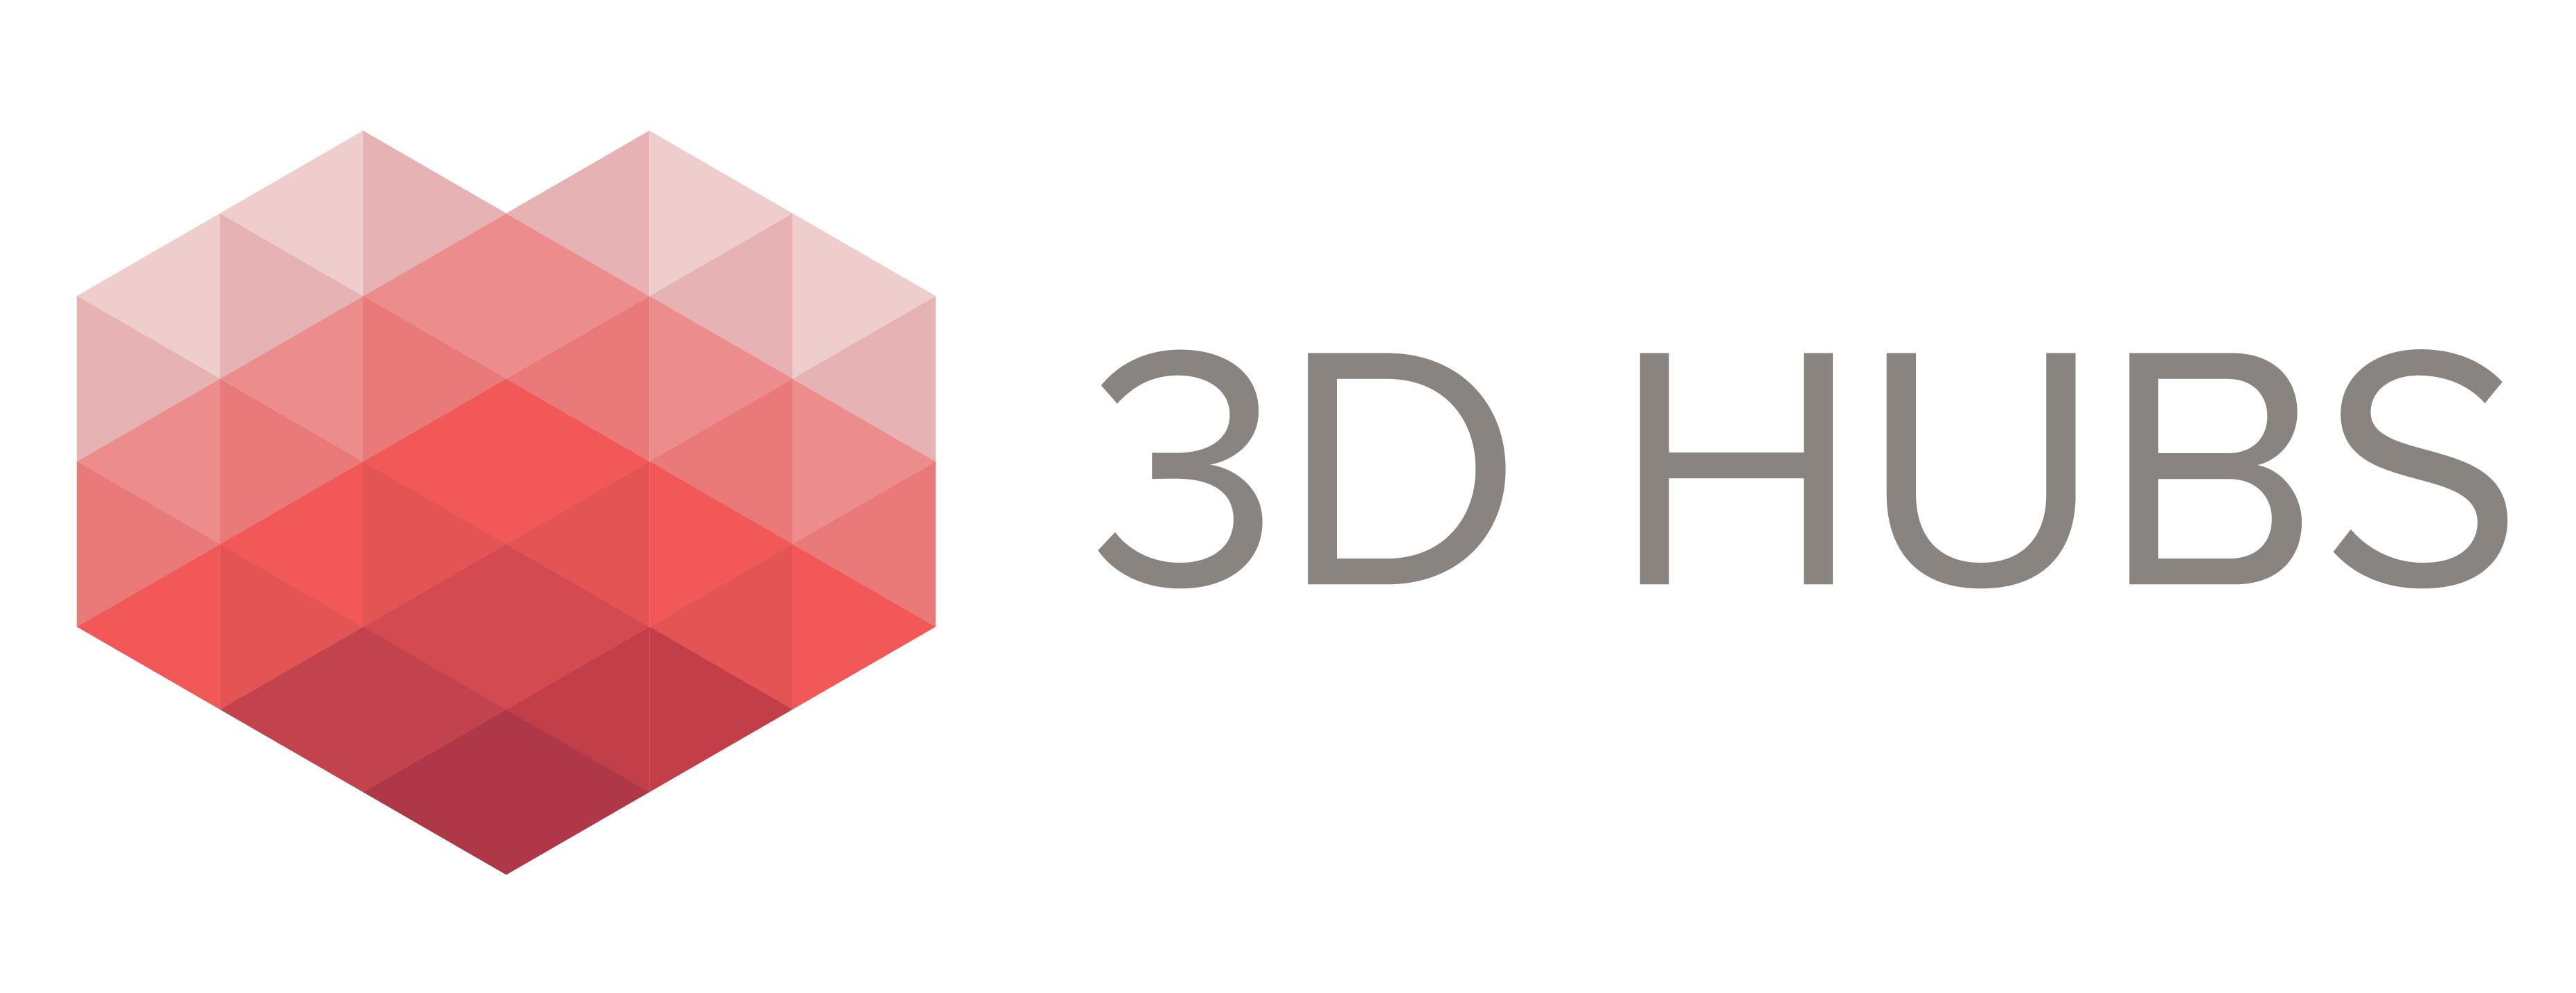 3D Hubs发布2017年第三季度全球3D打印趋势报告